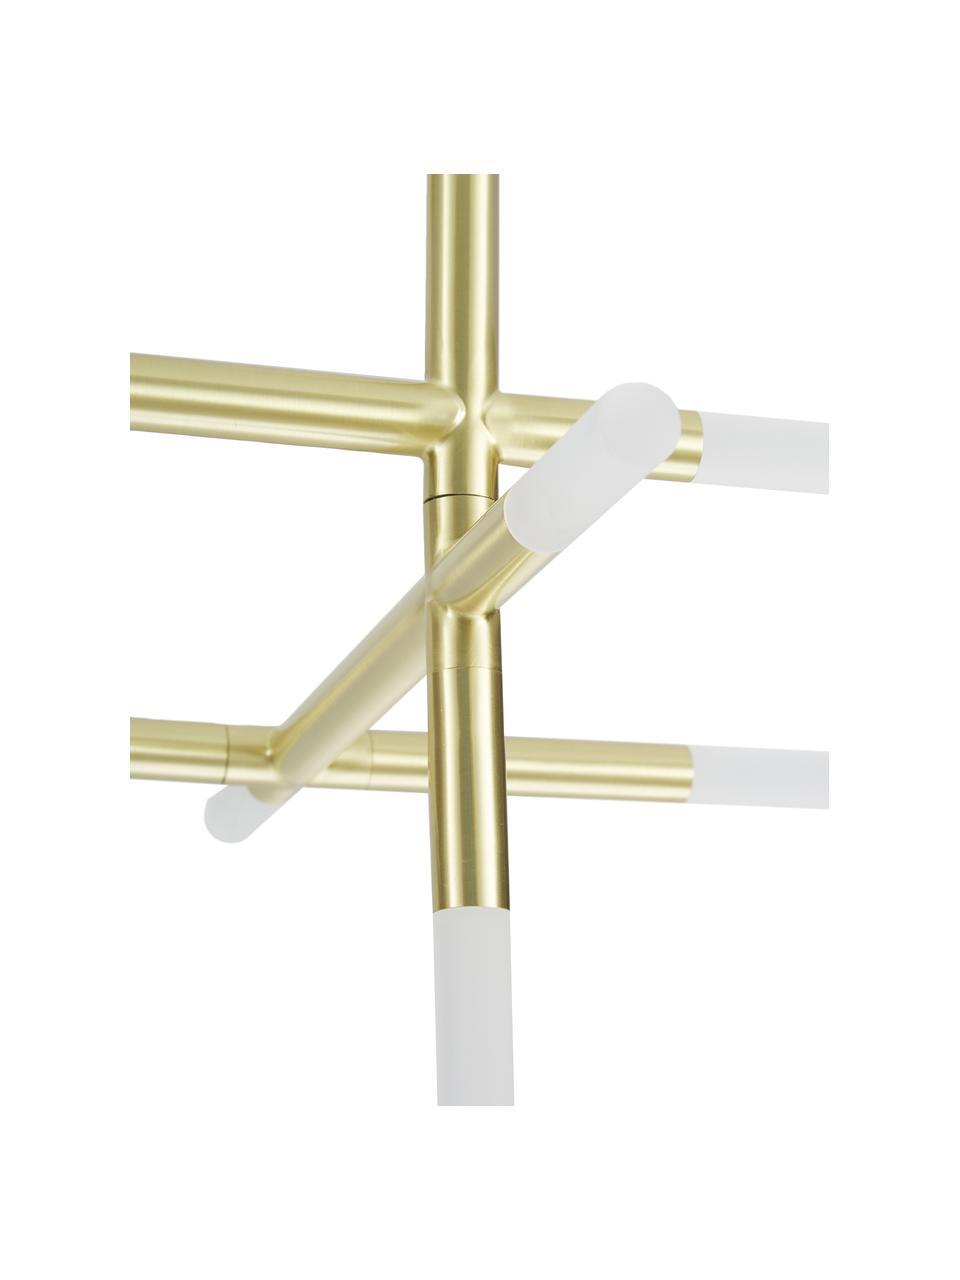 LED-Deckenleuchte Gratia in Gold, Baldachin: Metall, galvanisiert, Gold, 76 x 50 cm